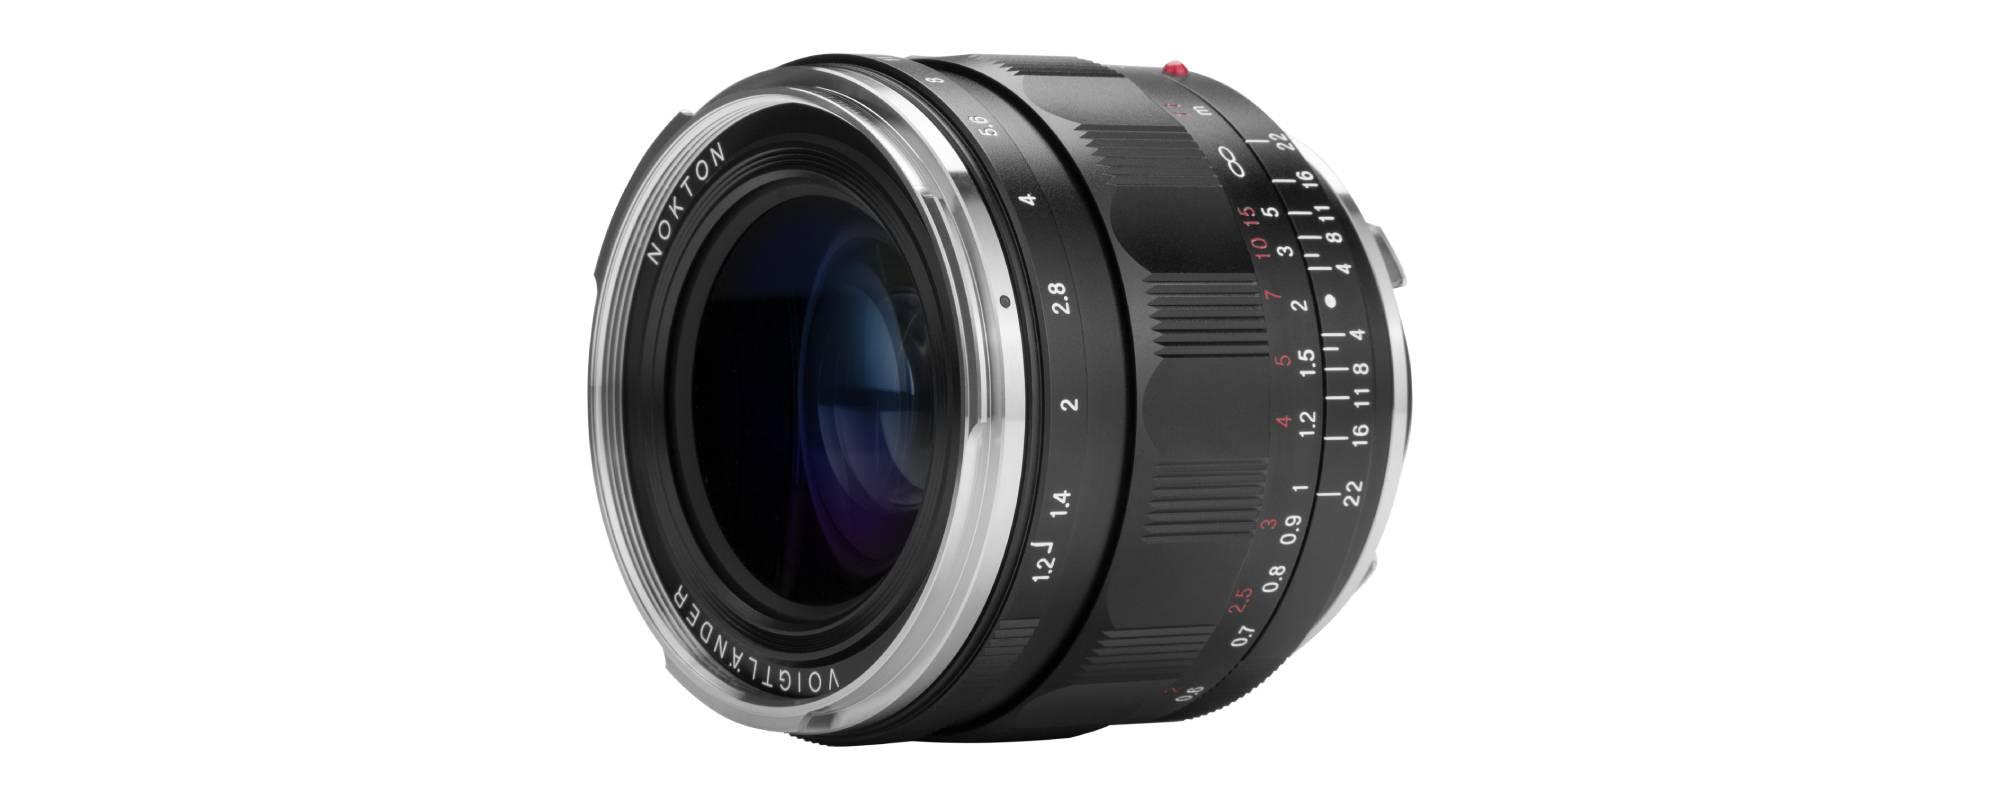 Voigtlander Nokton III 35mm f/1.2 lens for Leica M side view